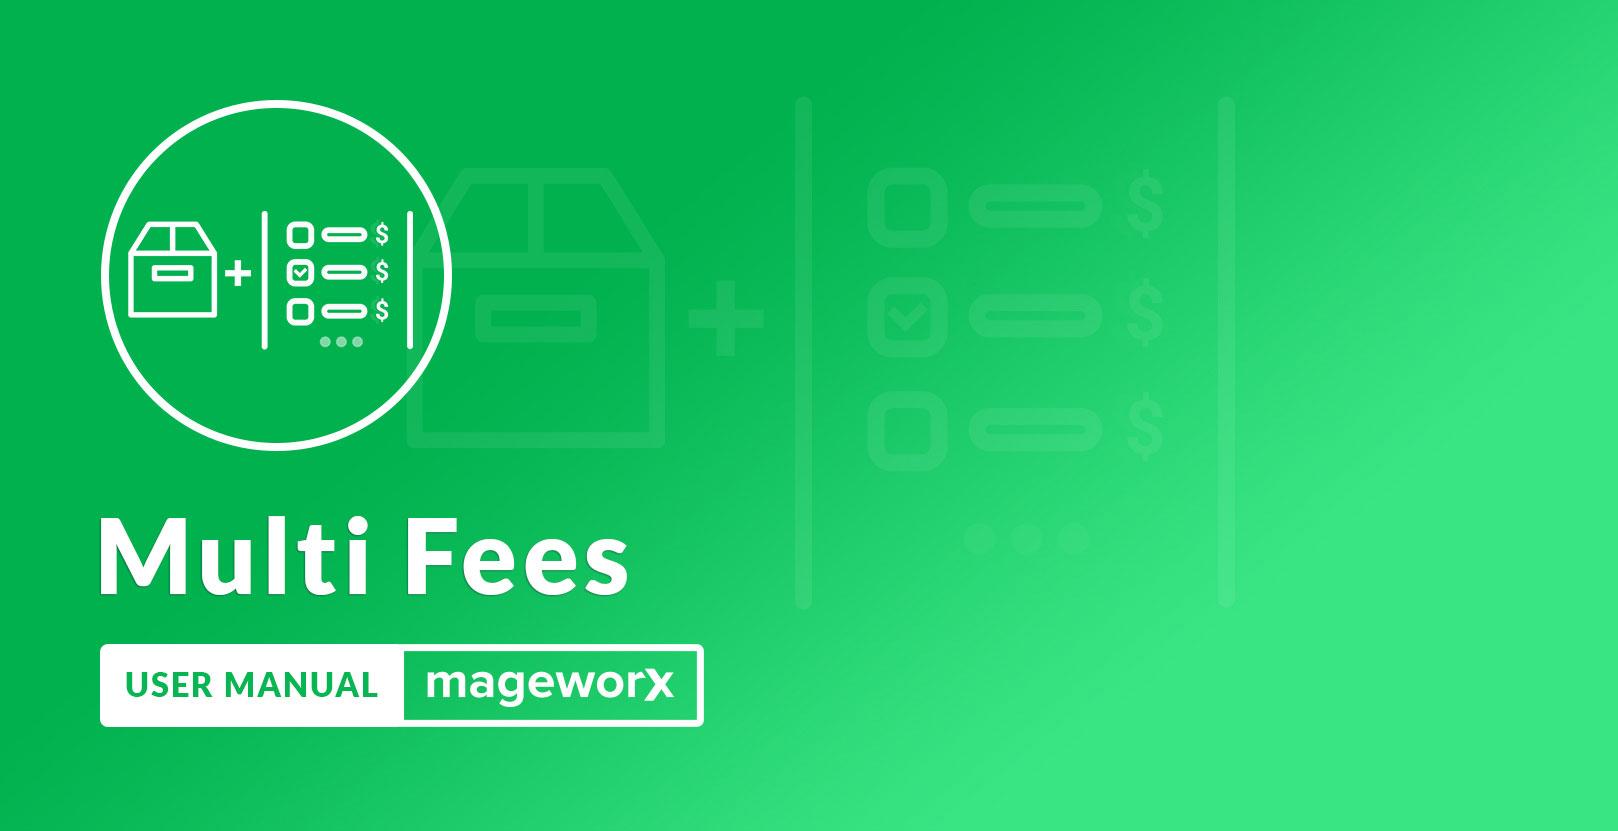 Magento 2 Multi Fees User Guide - MageWorx